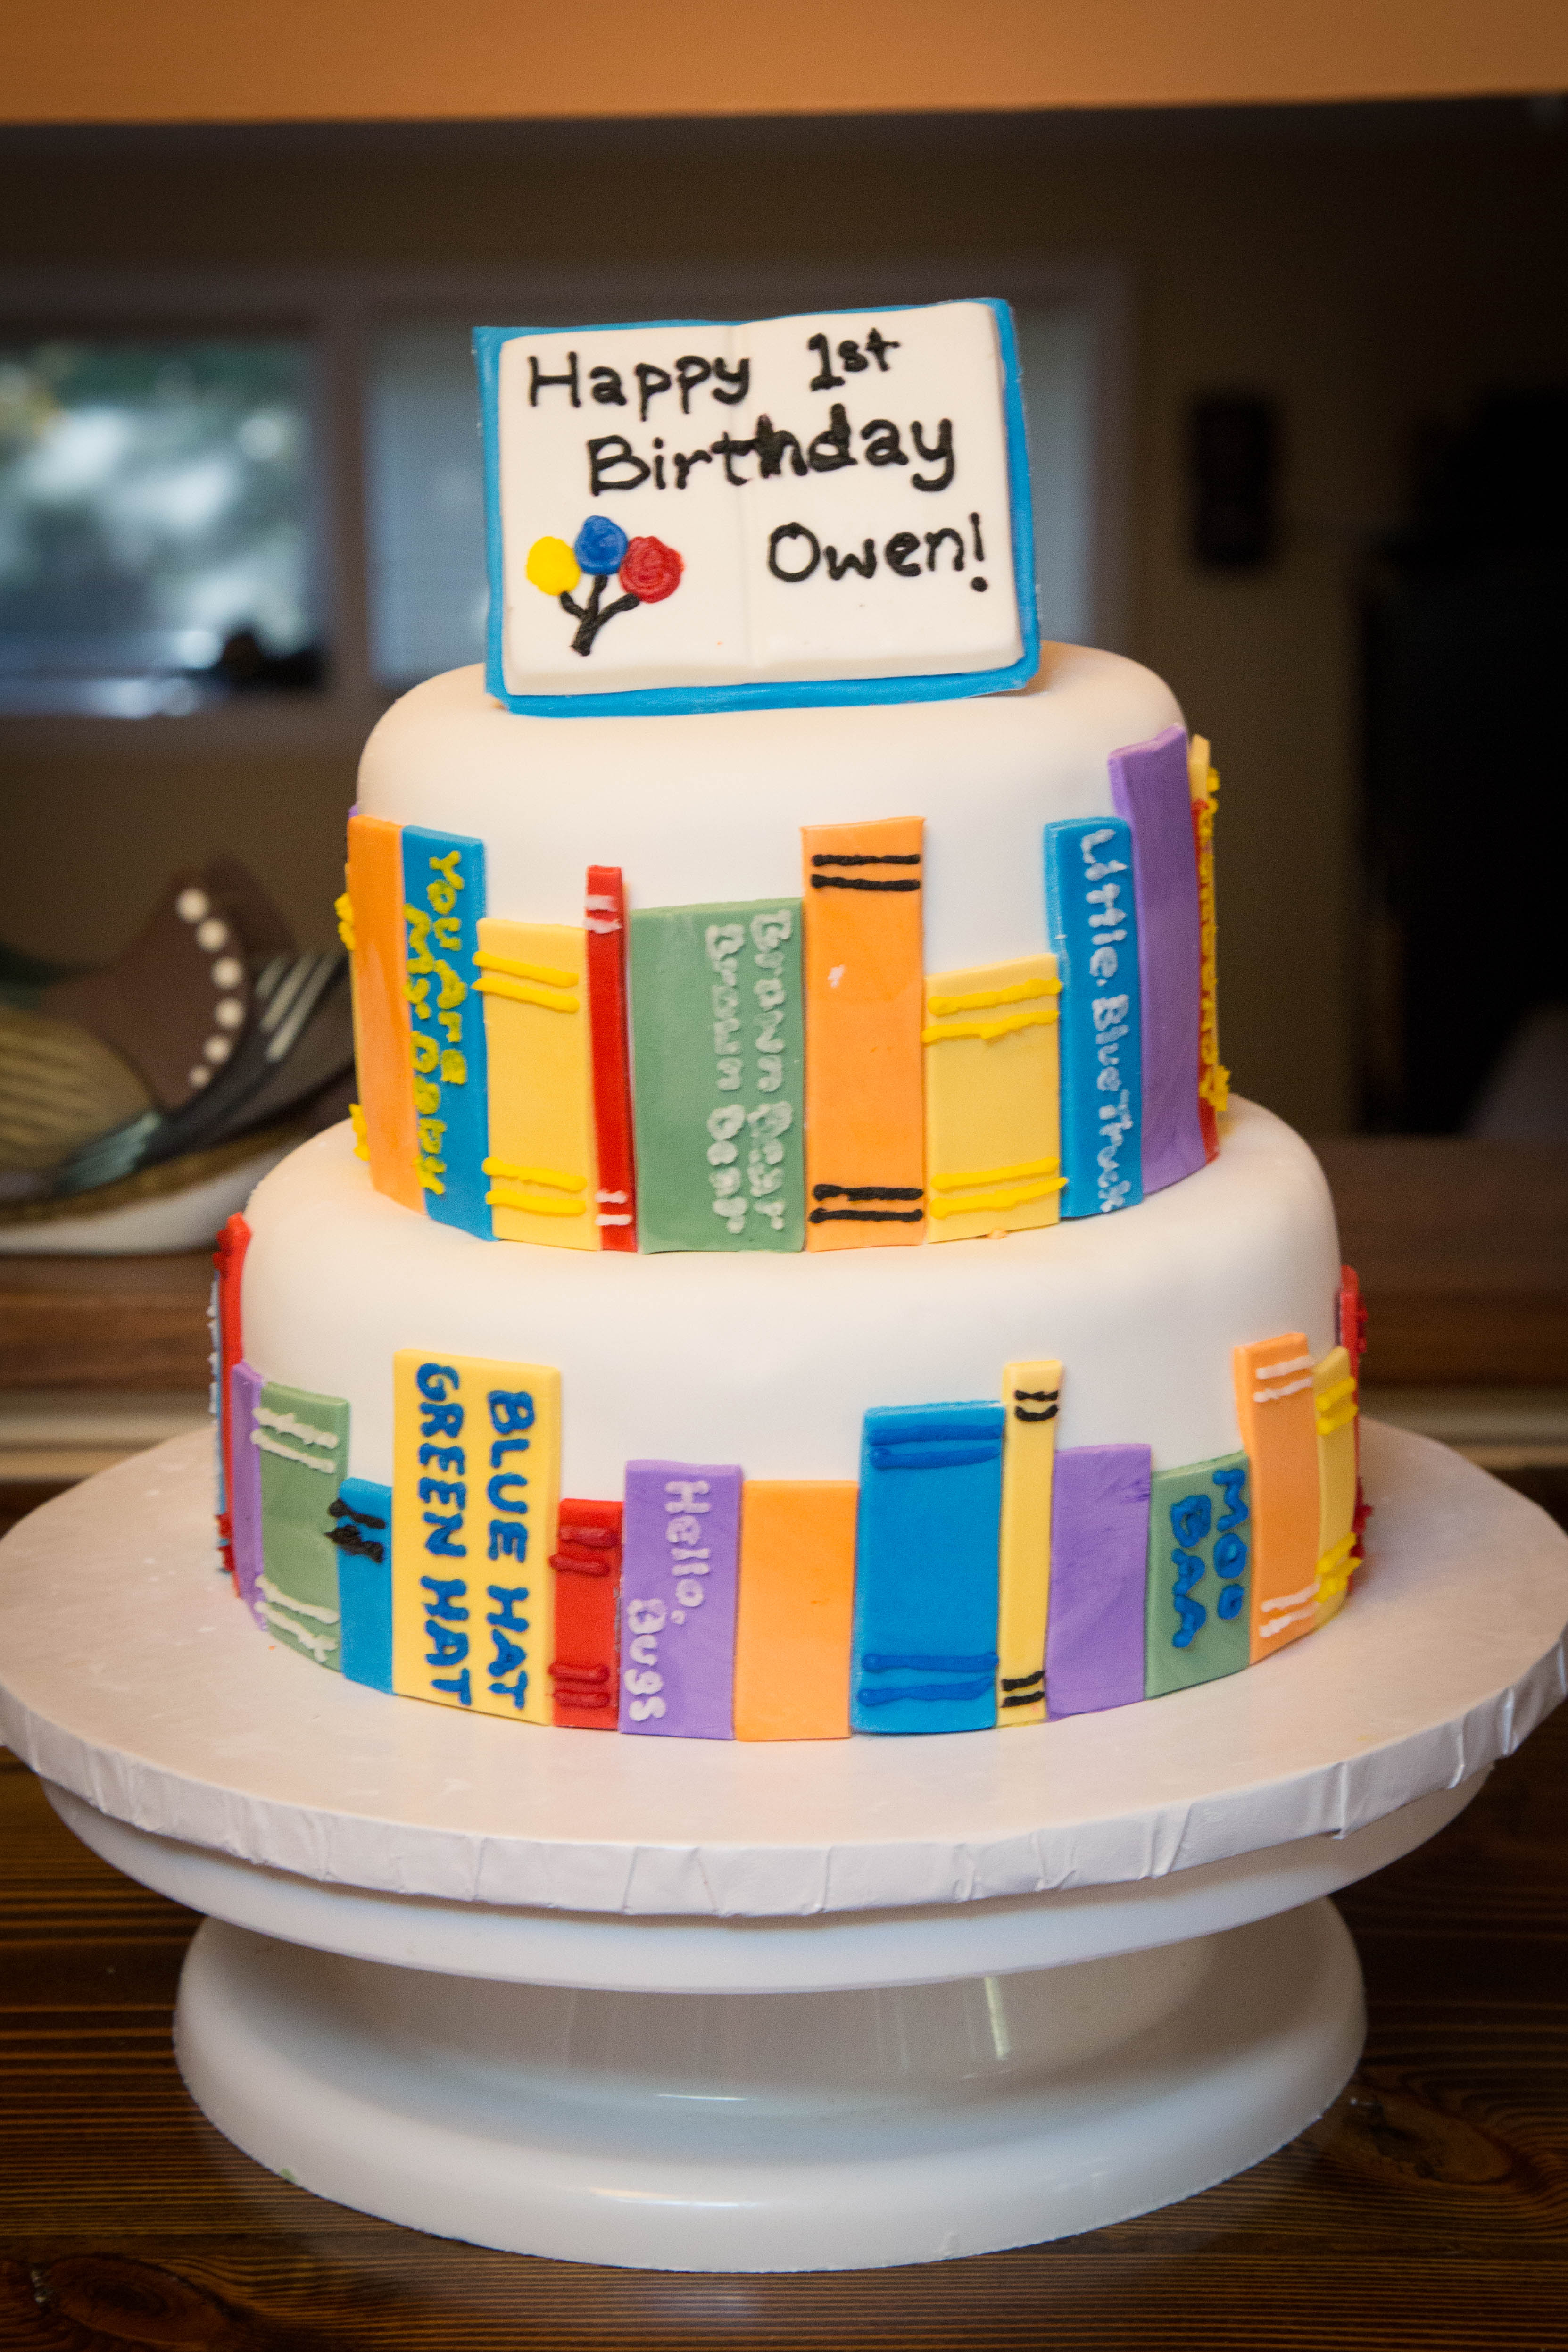 Owen S First Birthday Cake Simmiecakes